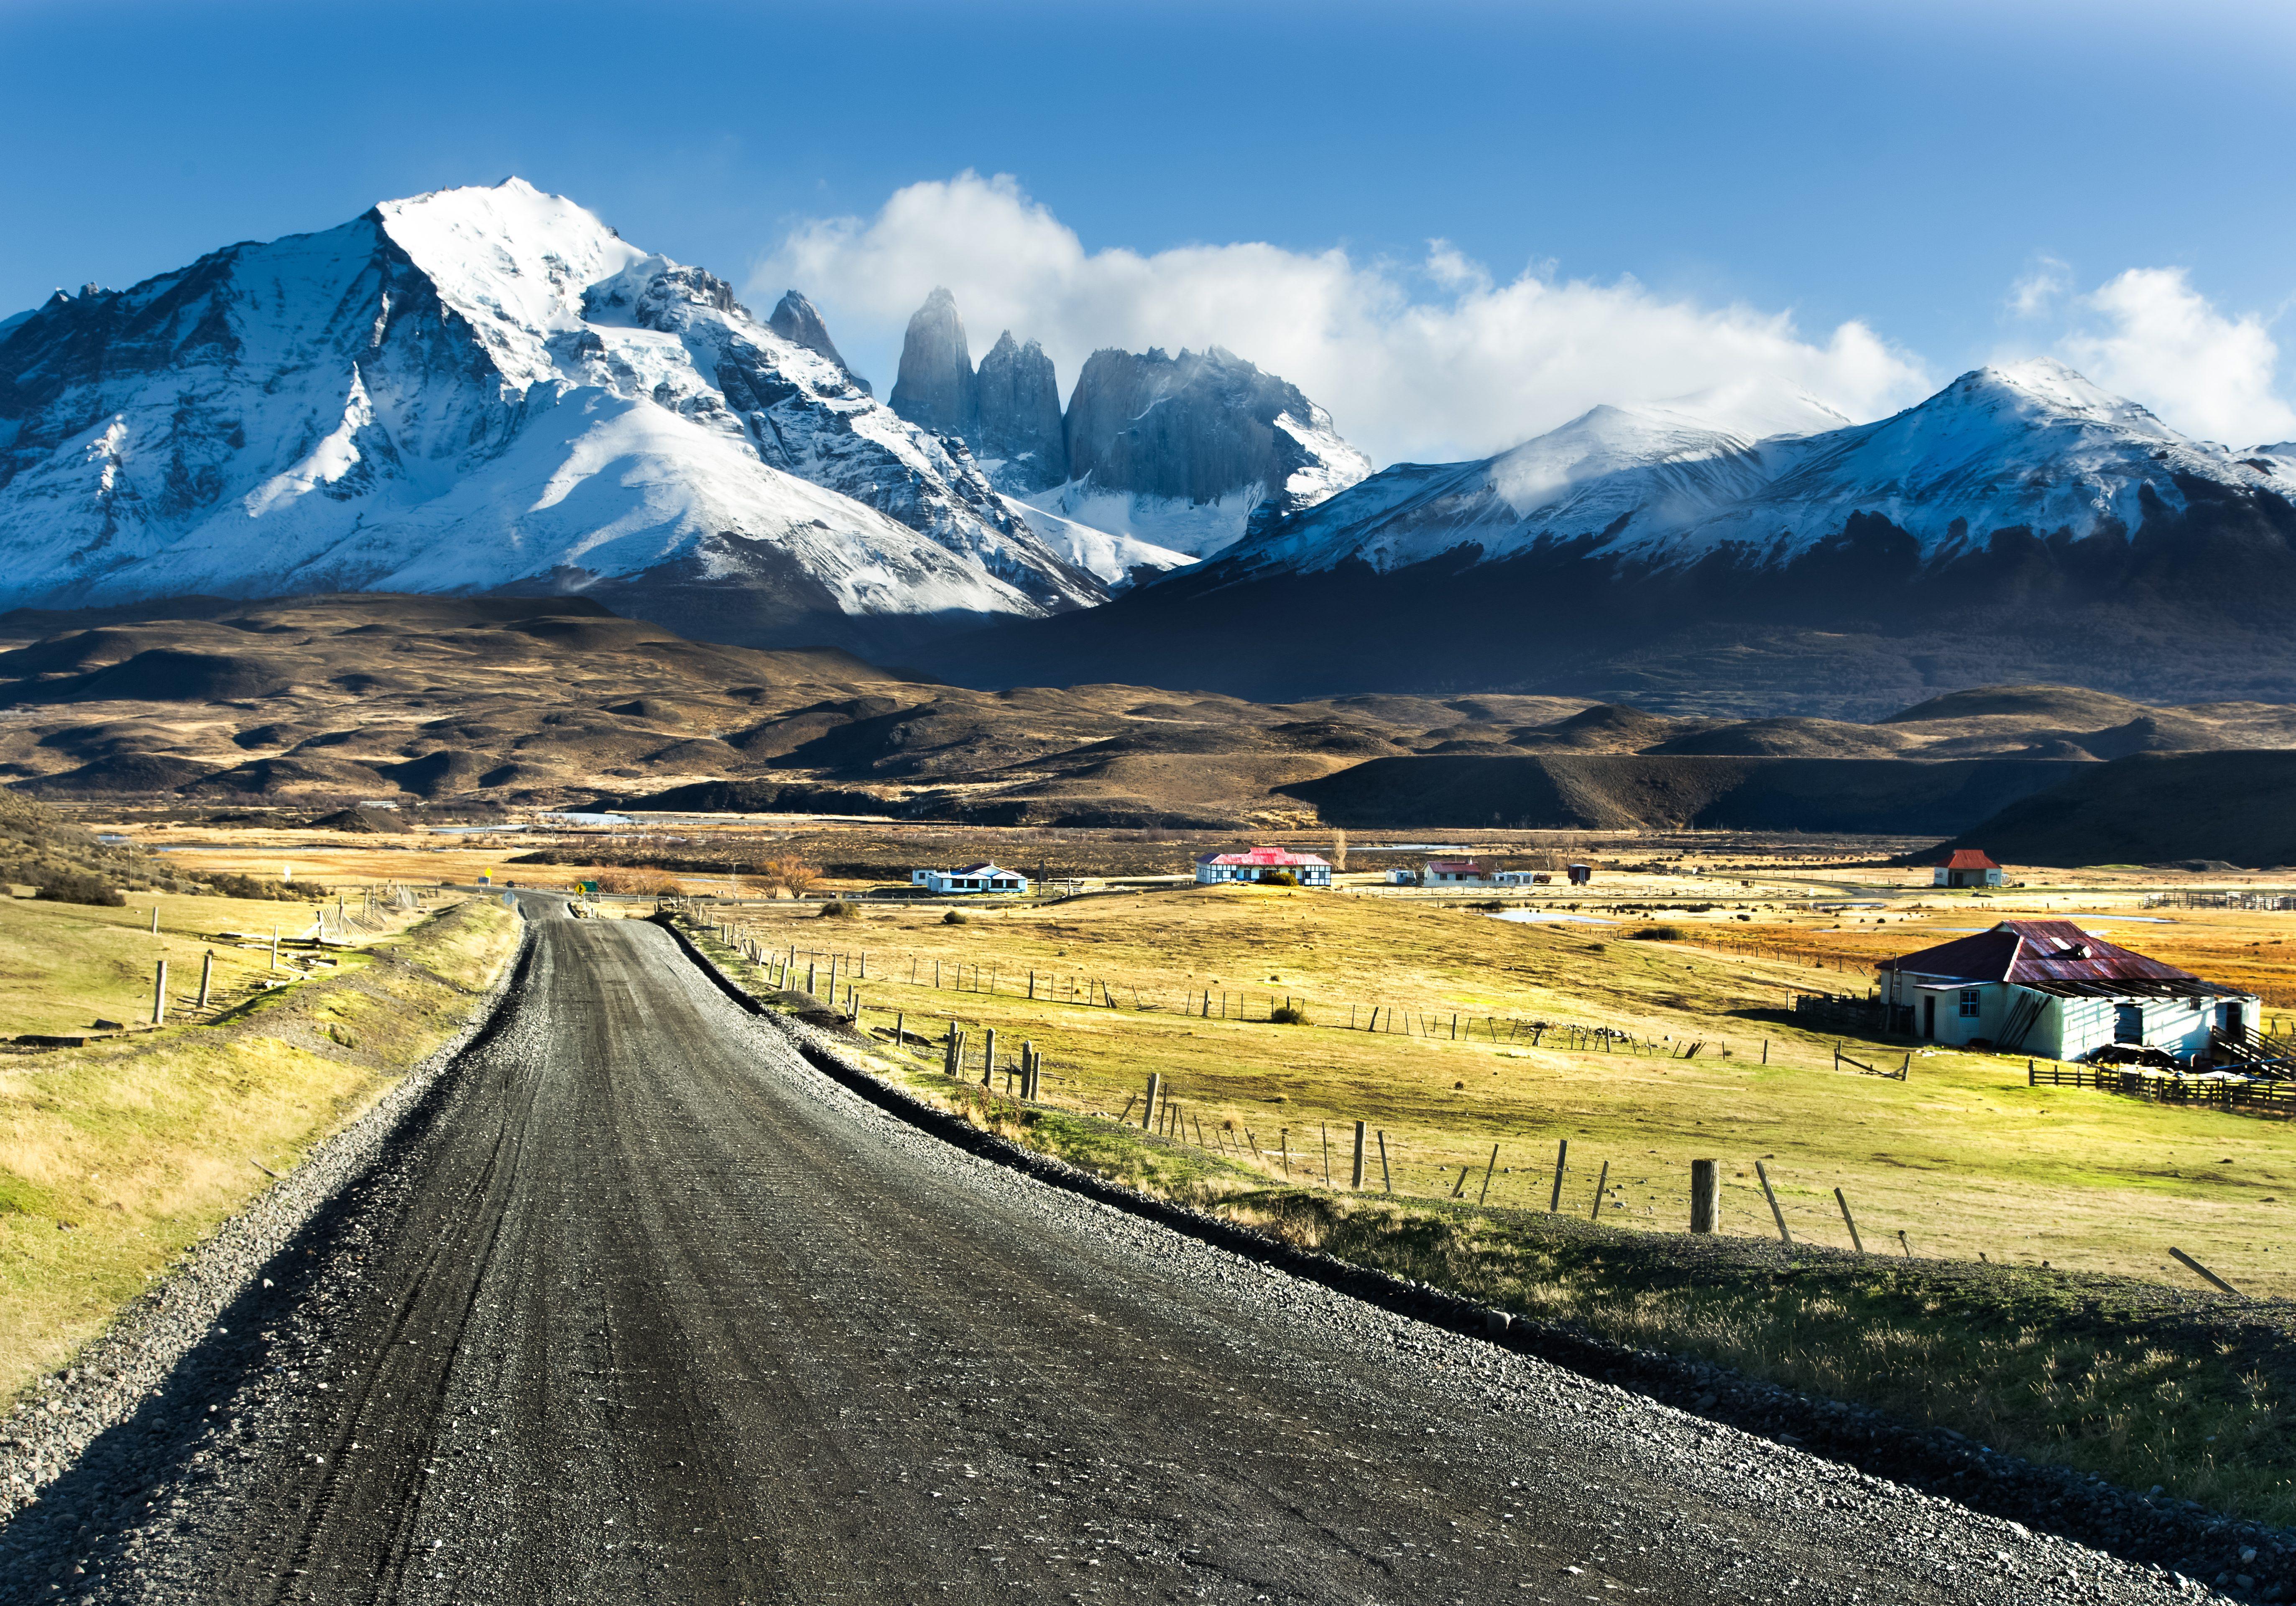 Road leading towards Torres del Paine National Park